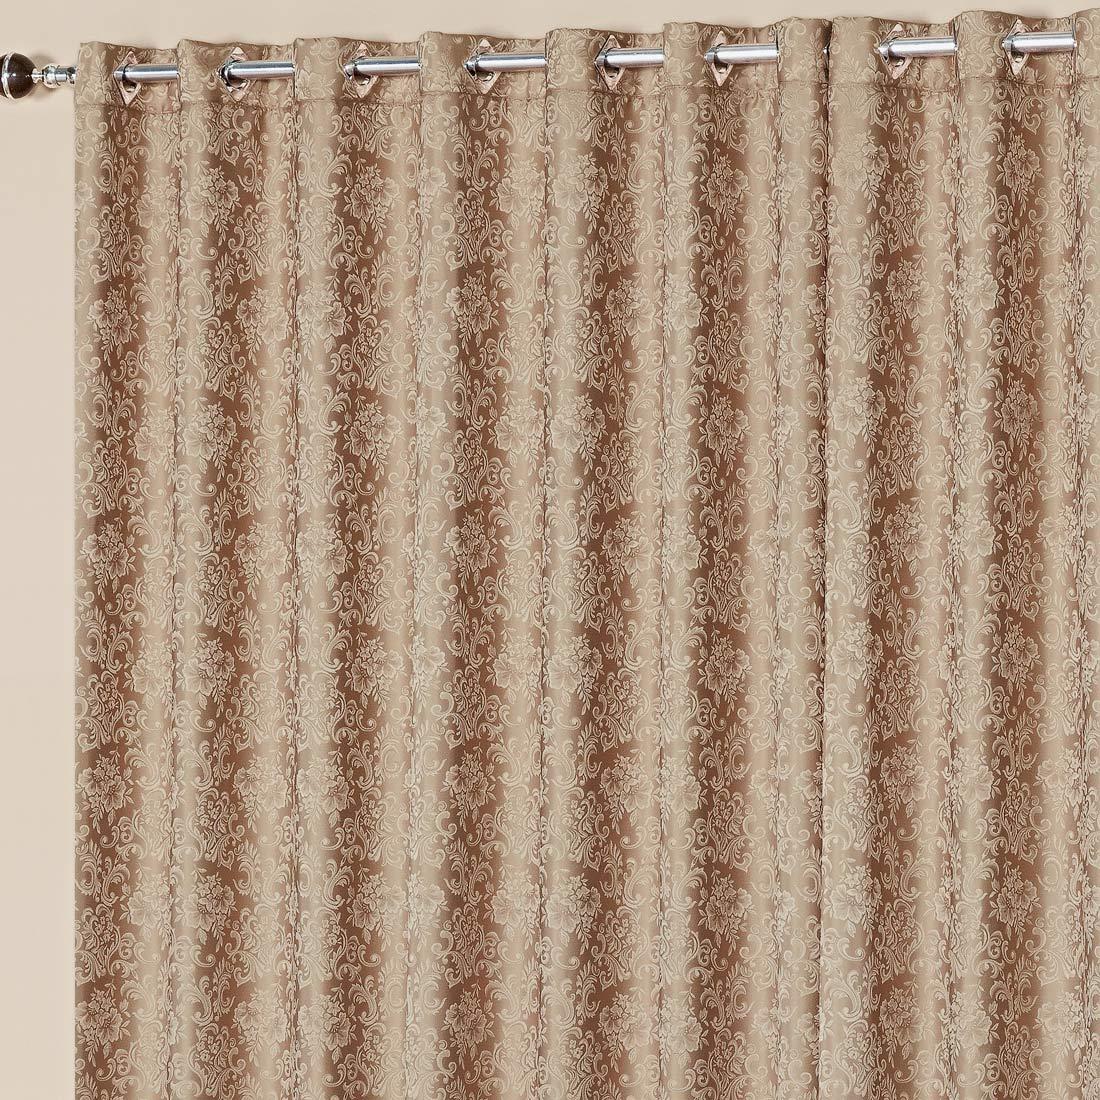 Cortina Nobre Jacquard Bege 2,00m x 1,70m p/ Varão Simples